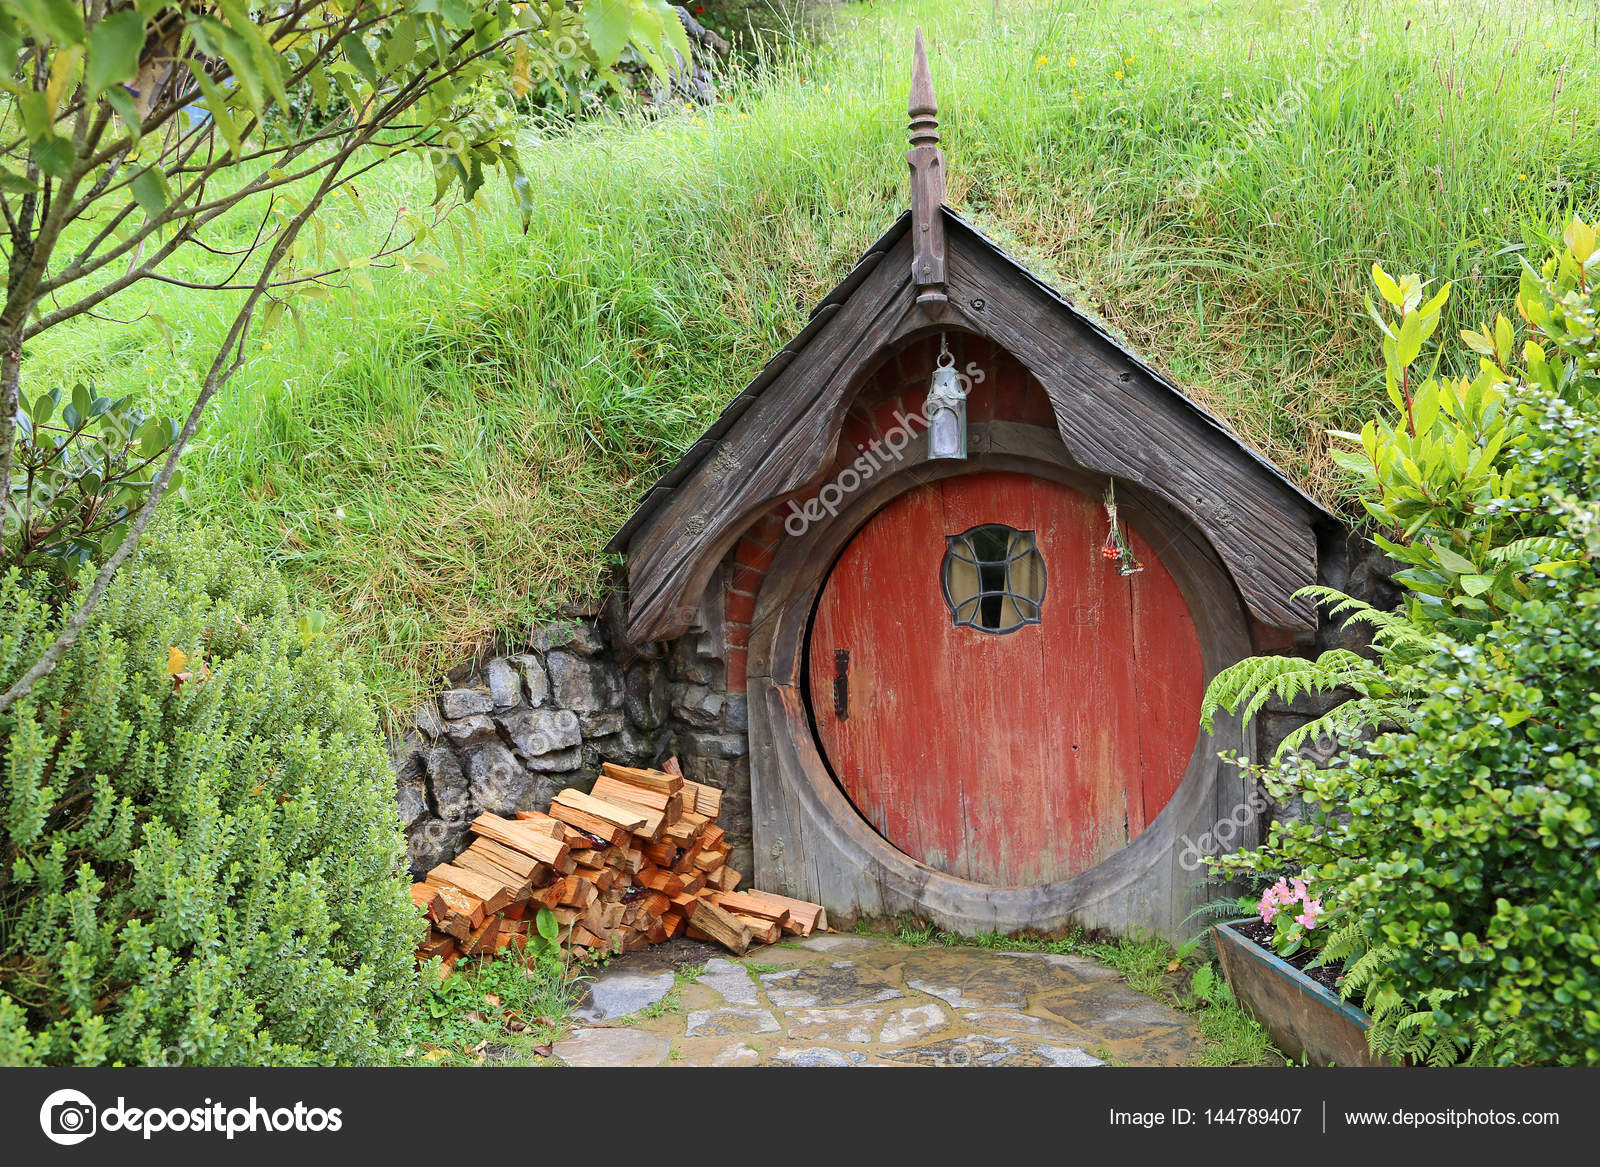 hobbit haus mit holzstapel redaktionelles stockfoto kojoty 144789407. Black Bedroom Furniture Sets. Home Design Ideas